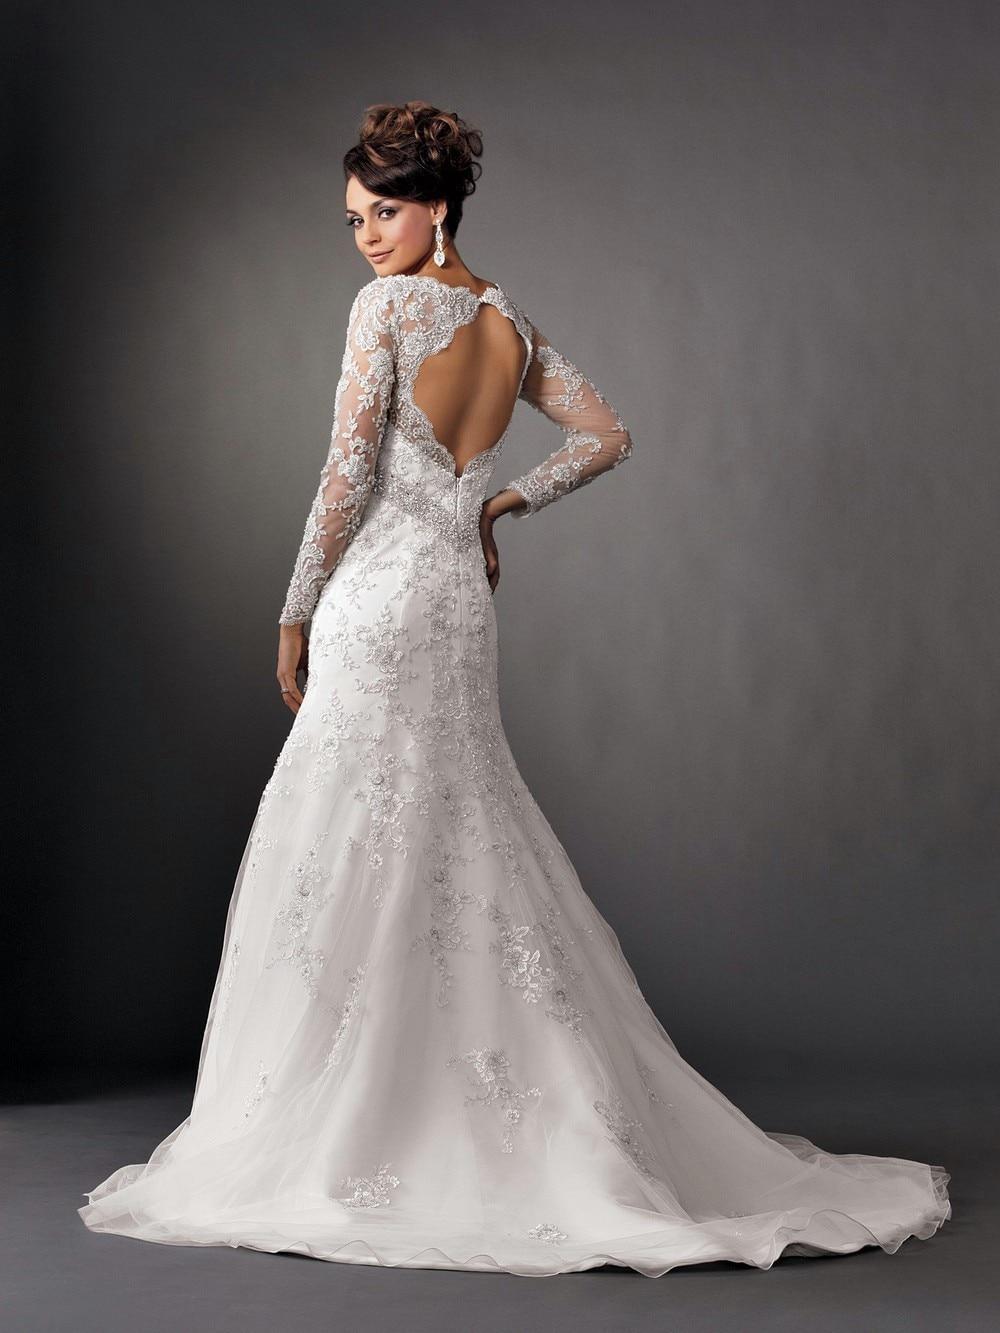 White Sequin Wedding Gown